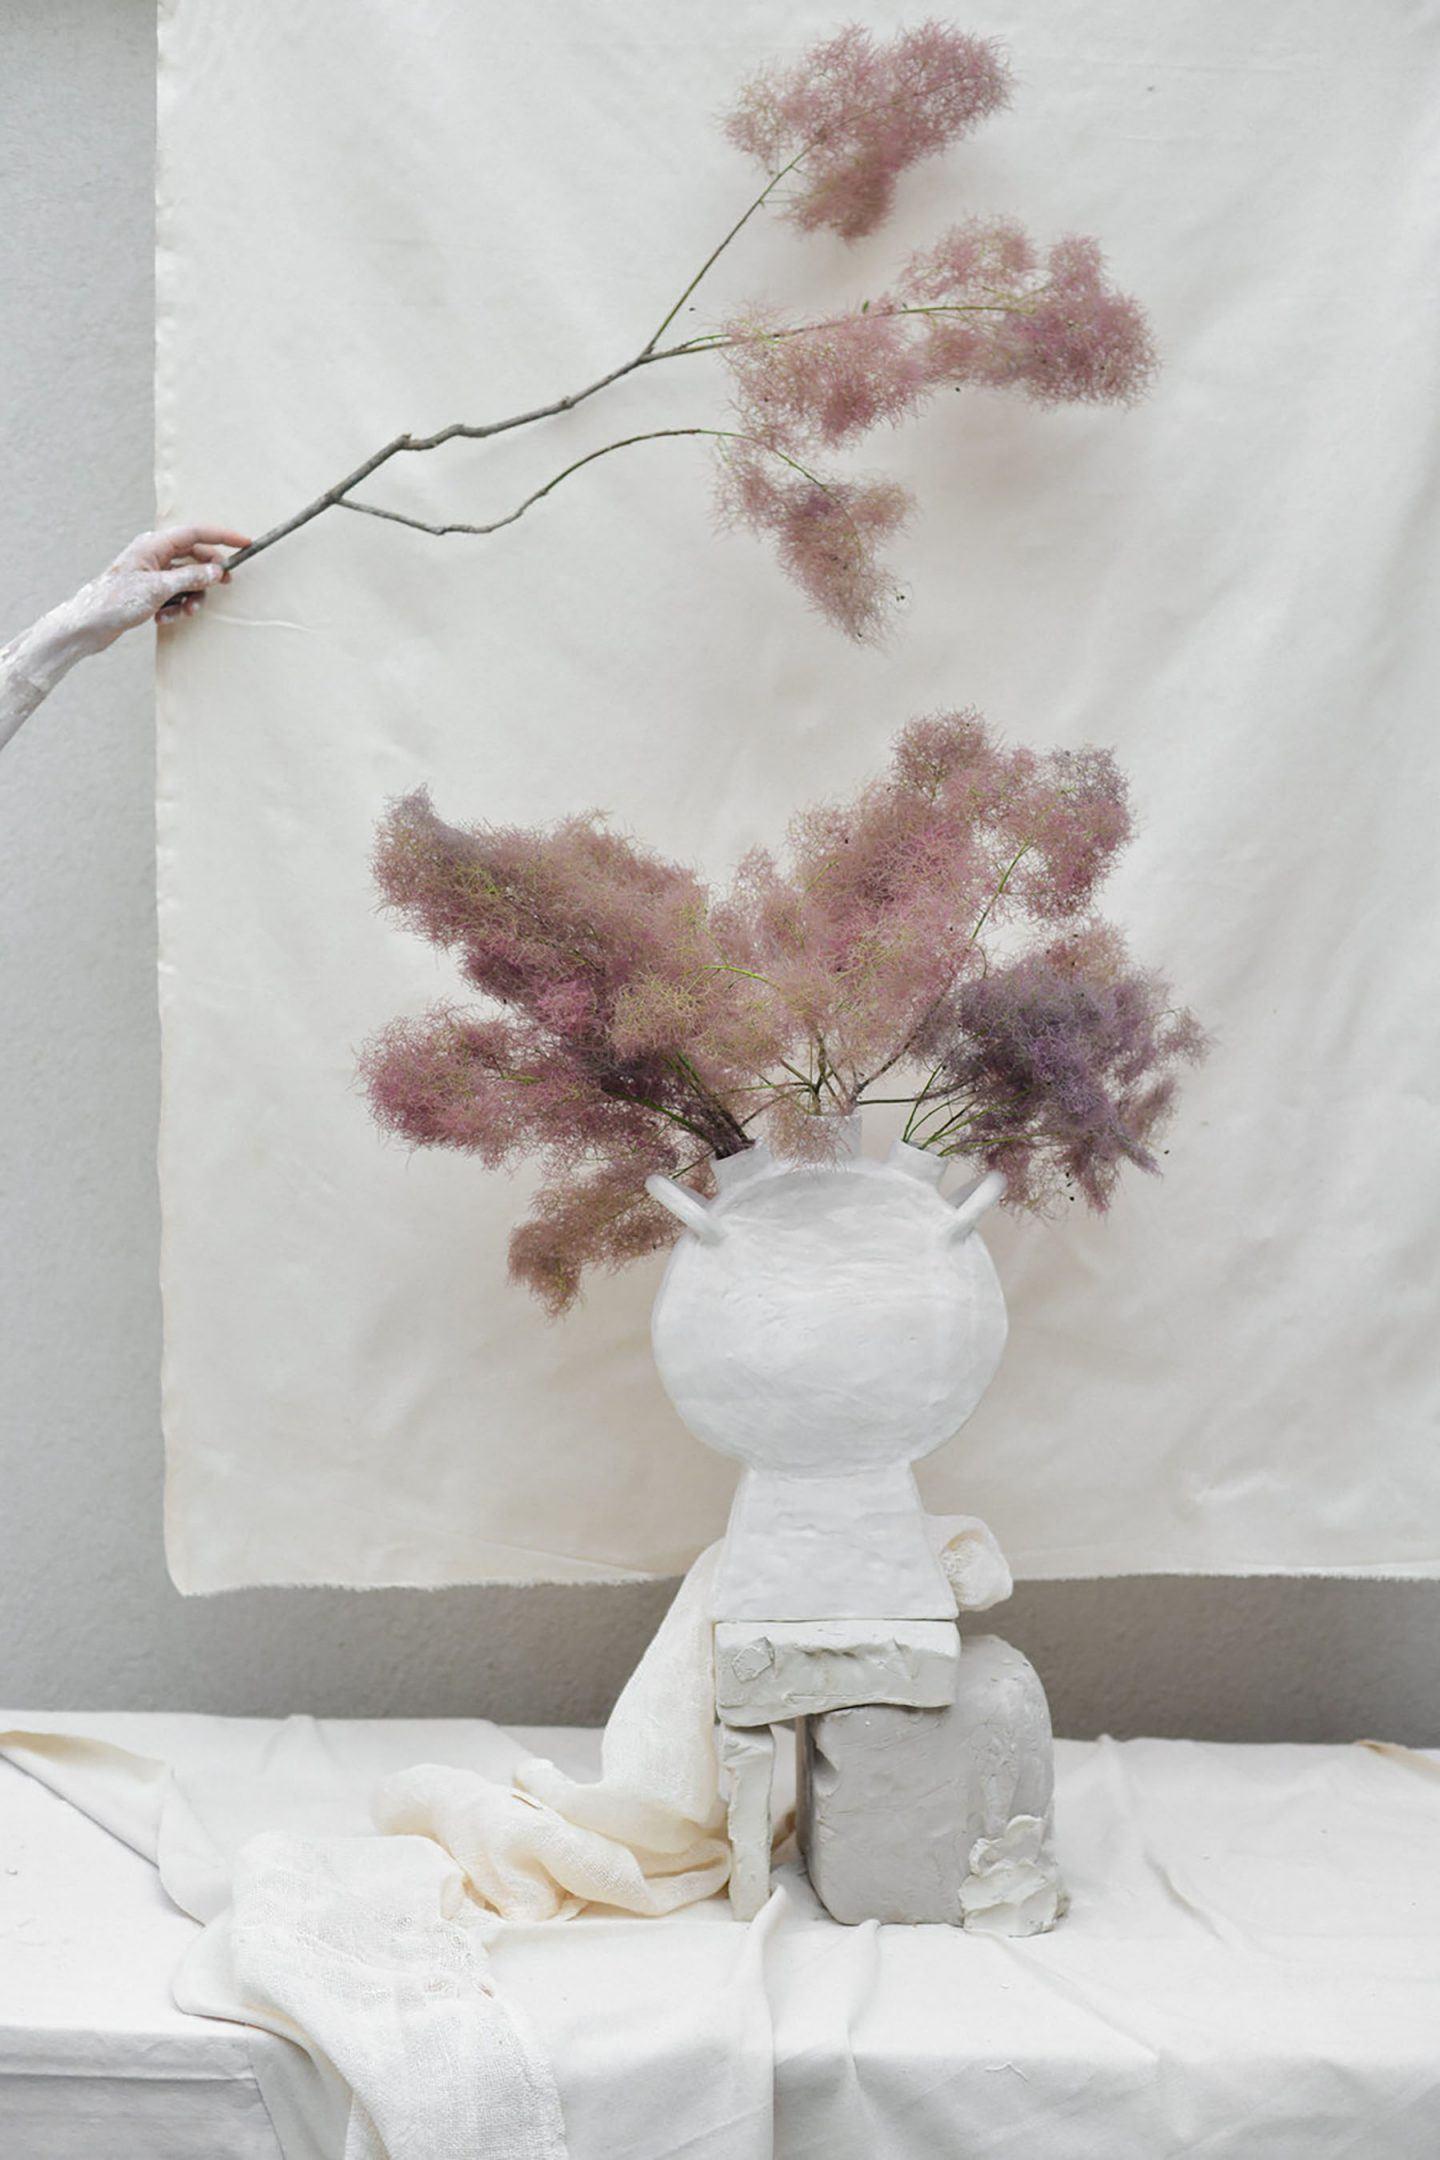 IGNANT-Art-Simone-Bodmer-Turner-EitherAnd-6